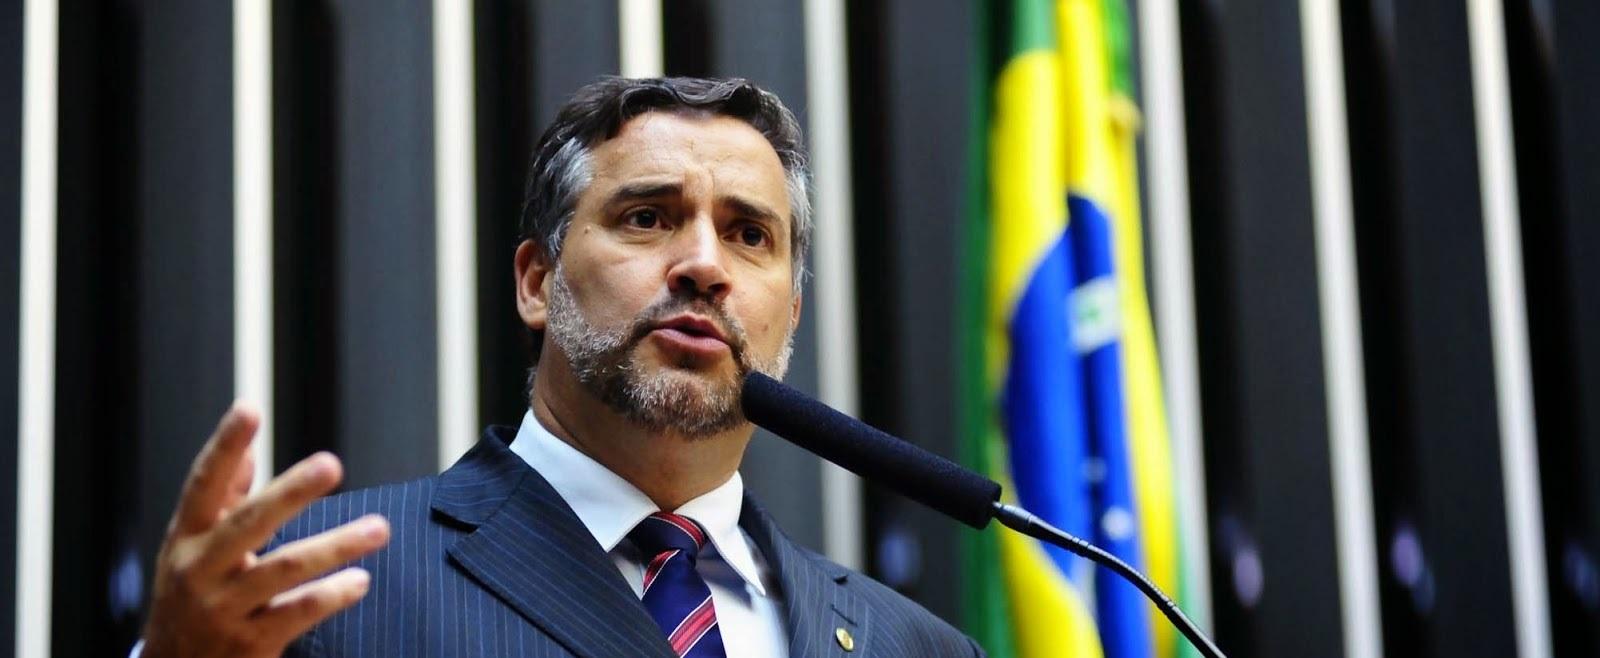 Lula será candidato mesmo condenado, diz líder do PT